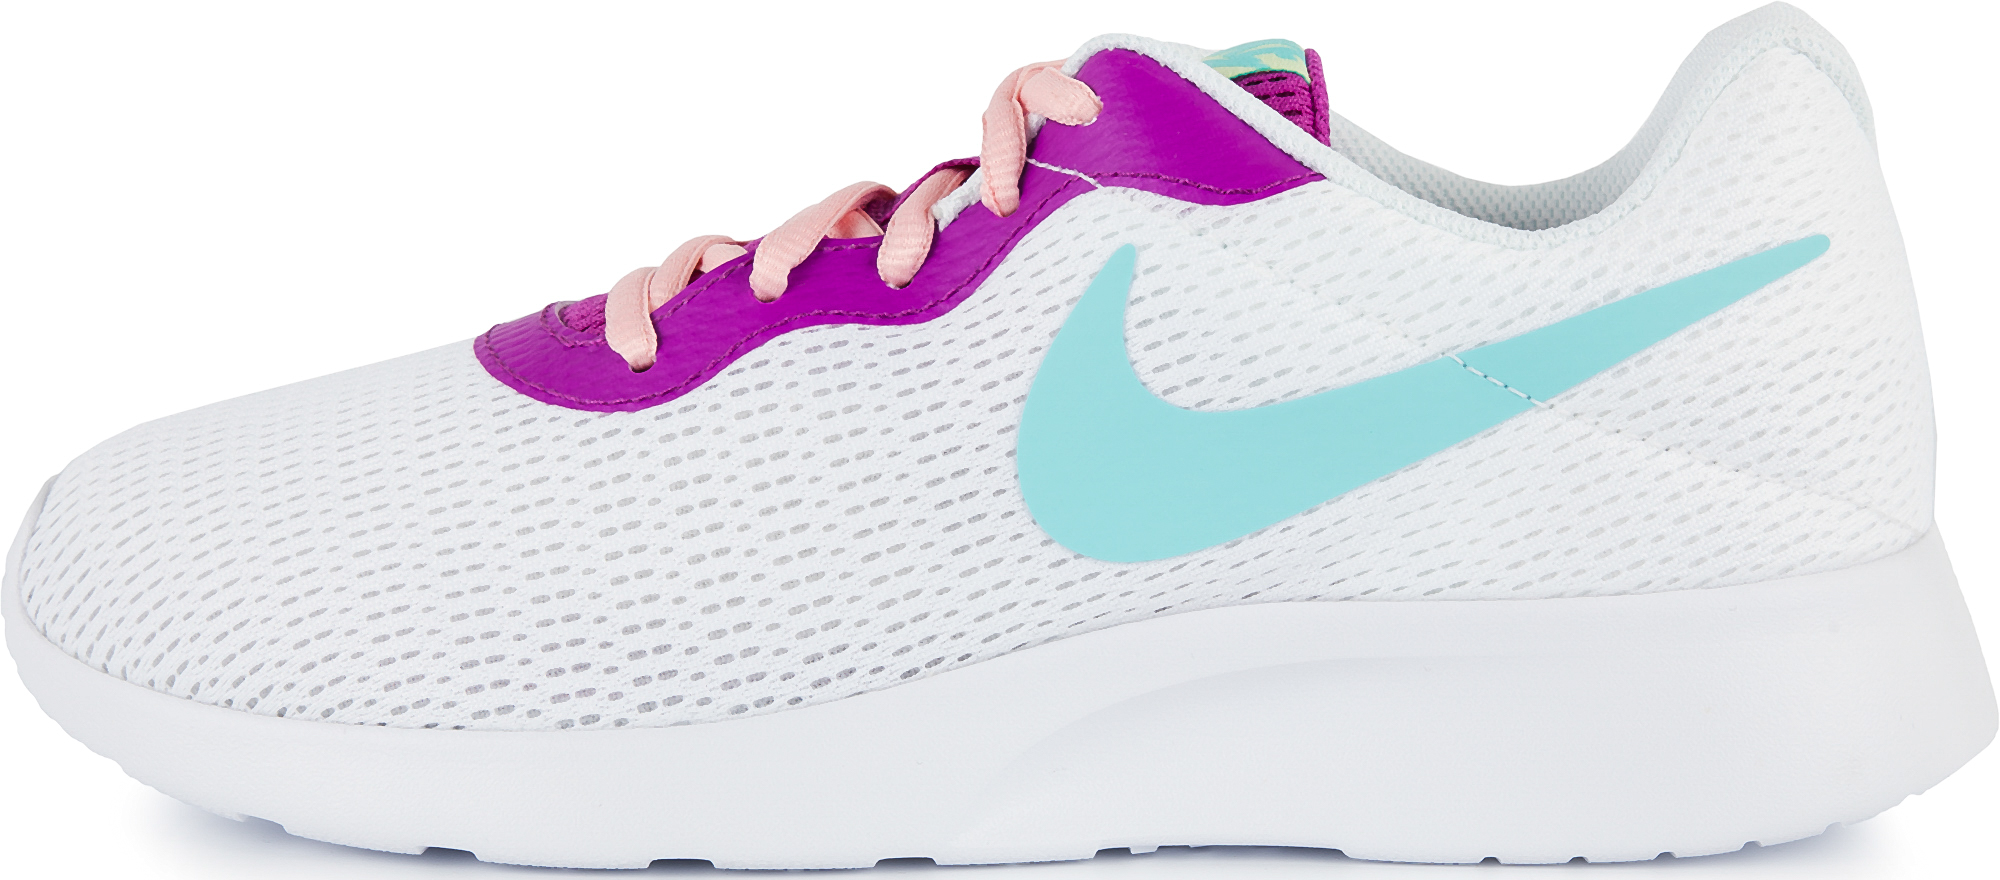 Nike Кроссовки женские Tanjun, размер 40